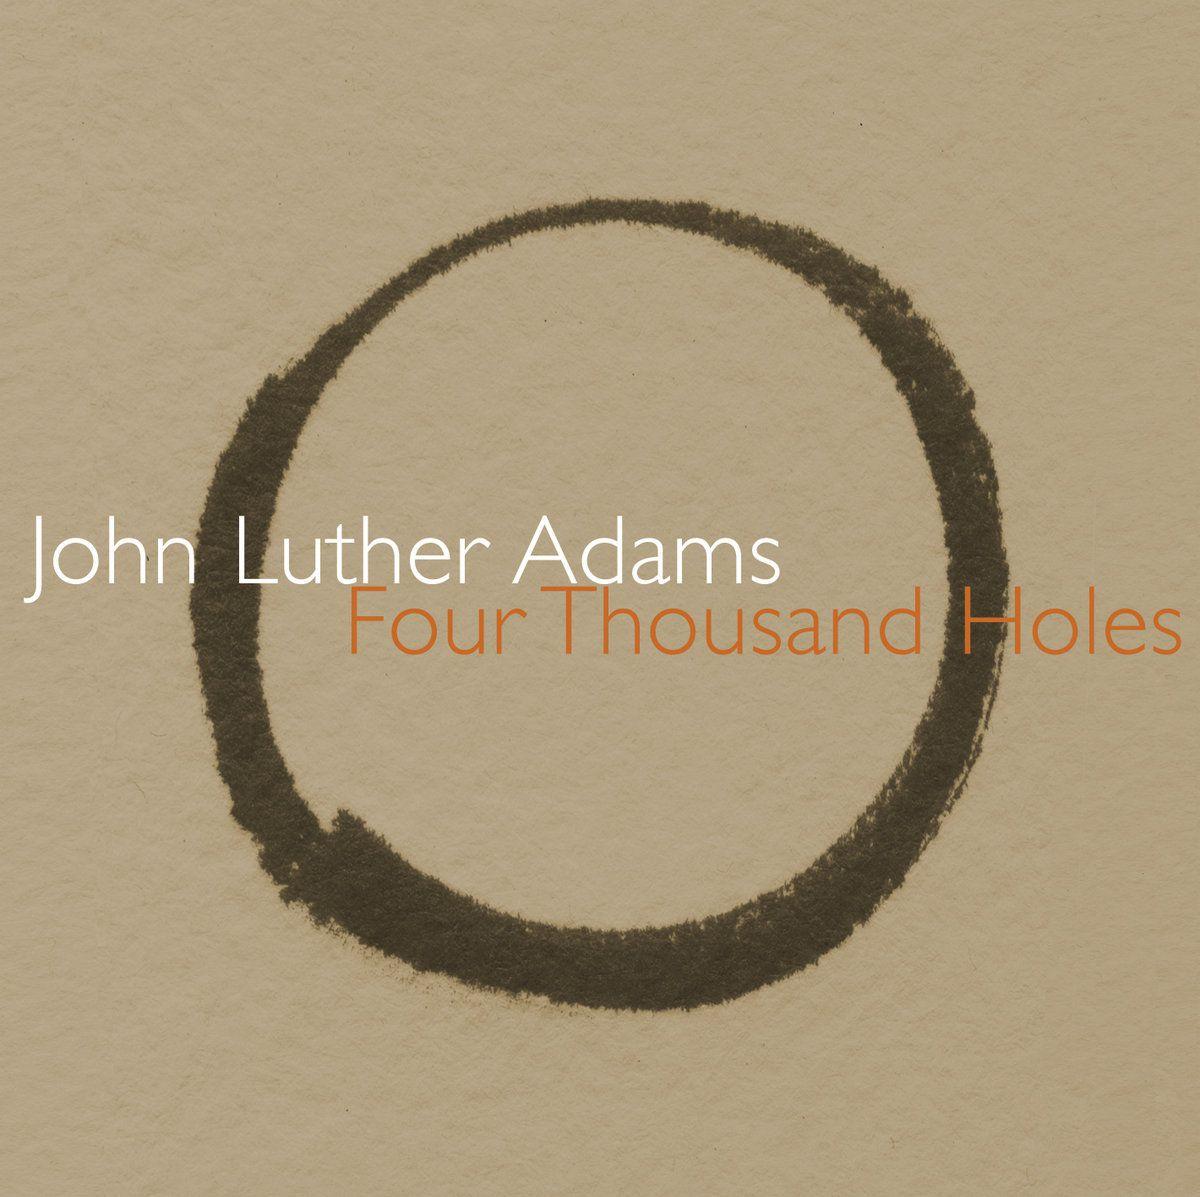 John Luther Adams - Four Thousand Holes